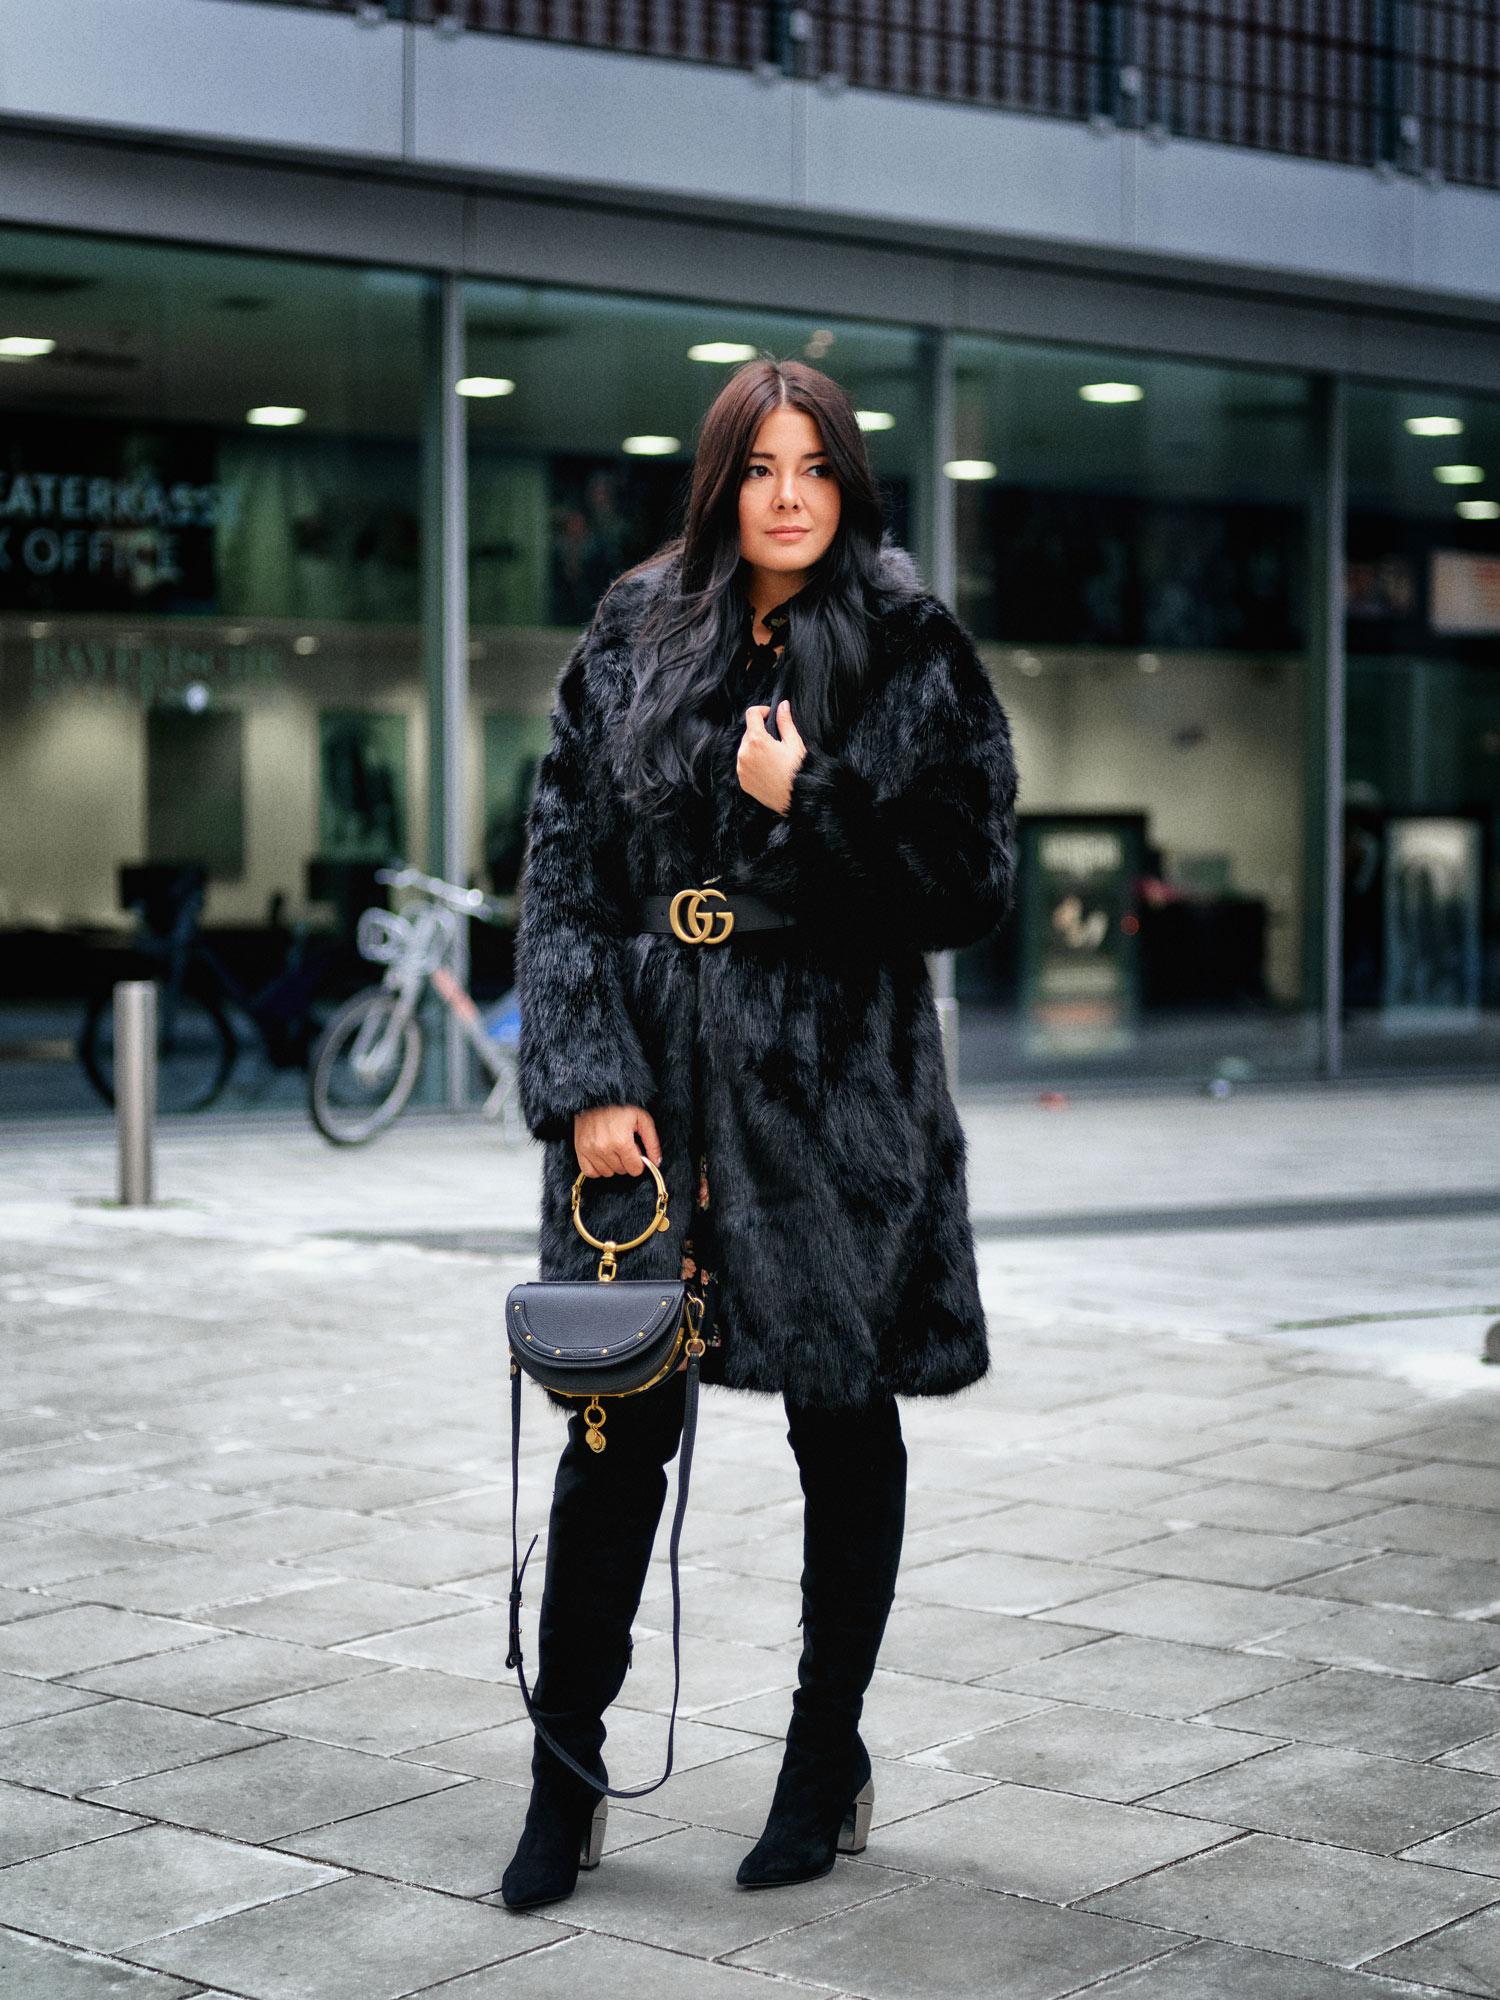 fashion-blogger-aus-muenchen-fashionblogger-lifestyleblogger-beautyblogger-fashion-blogger-modeblogger-modeblog-munich-blog-muenchen-faux-fur-bye-bye-echtpelz